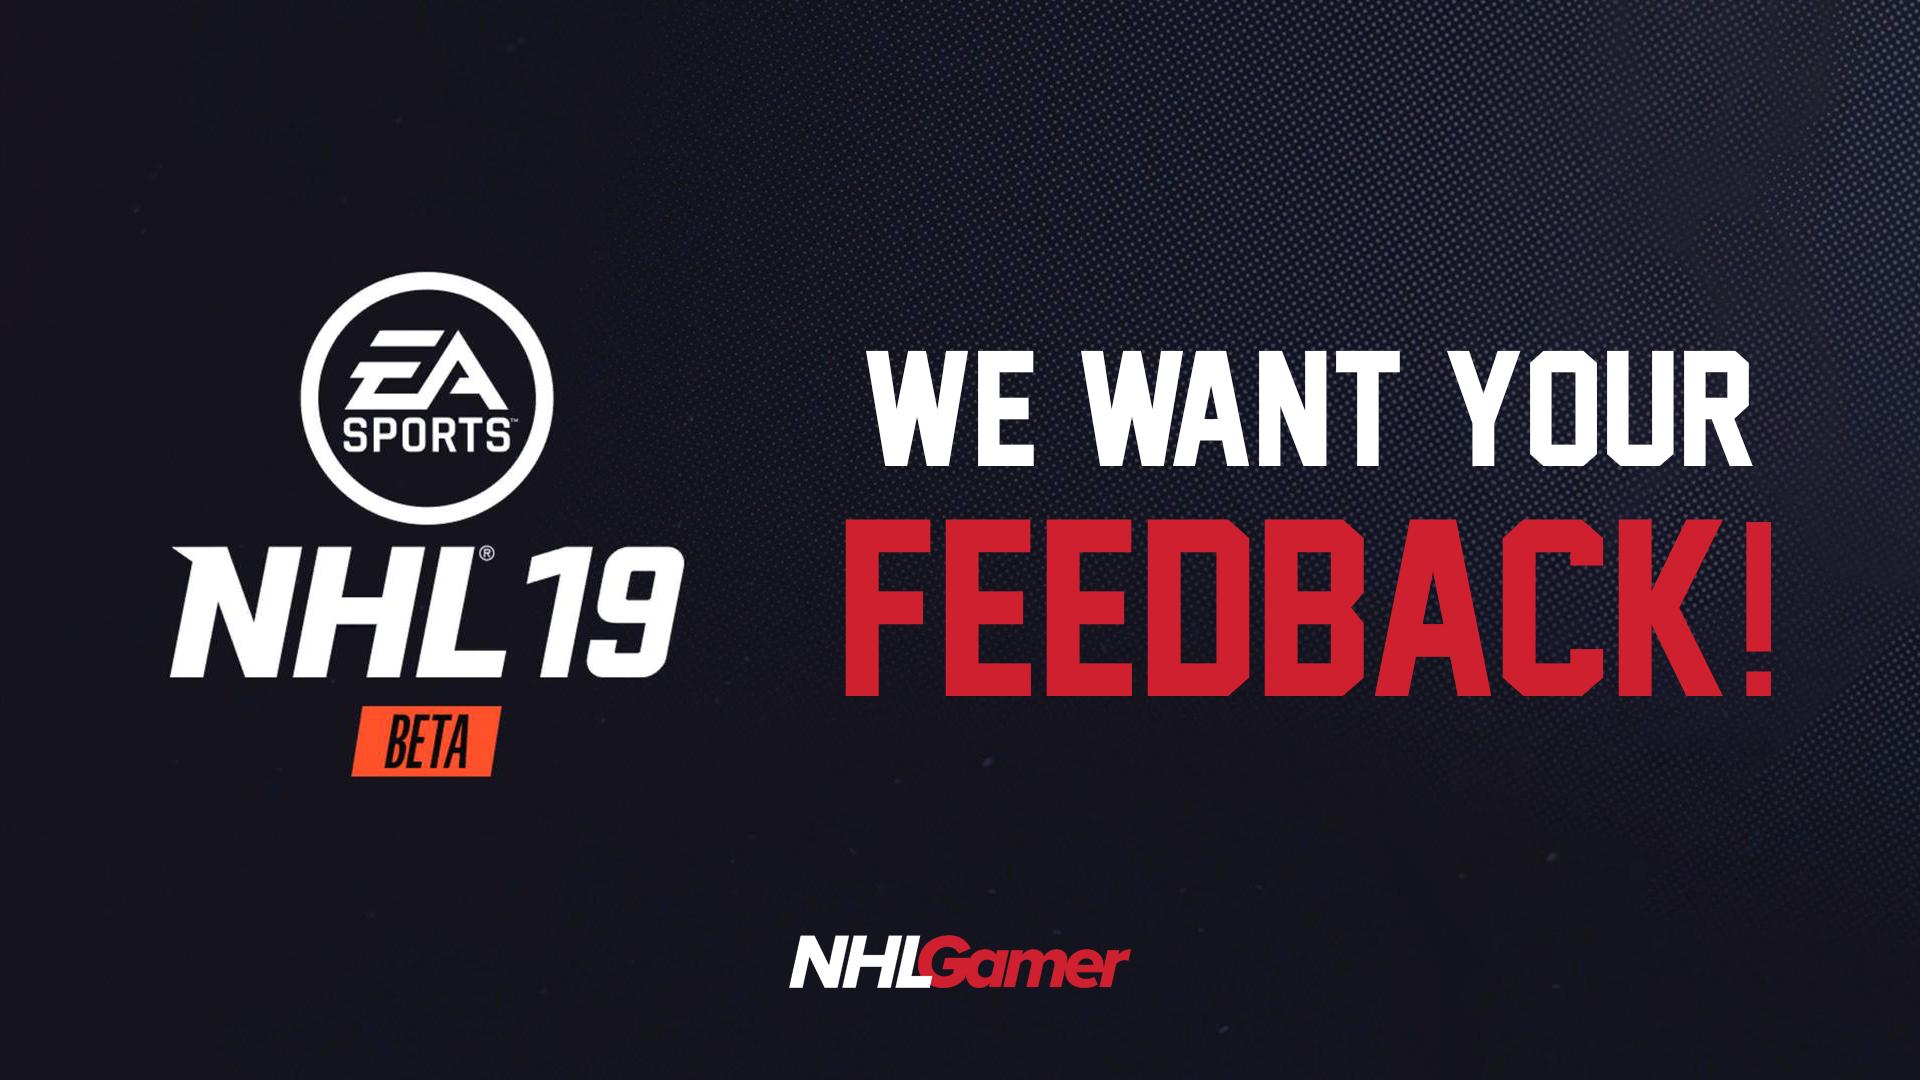 NHL 15 hut matchmaking gratis online dating Swiss